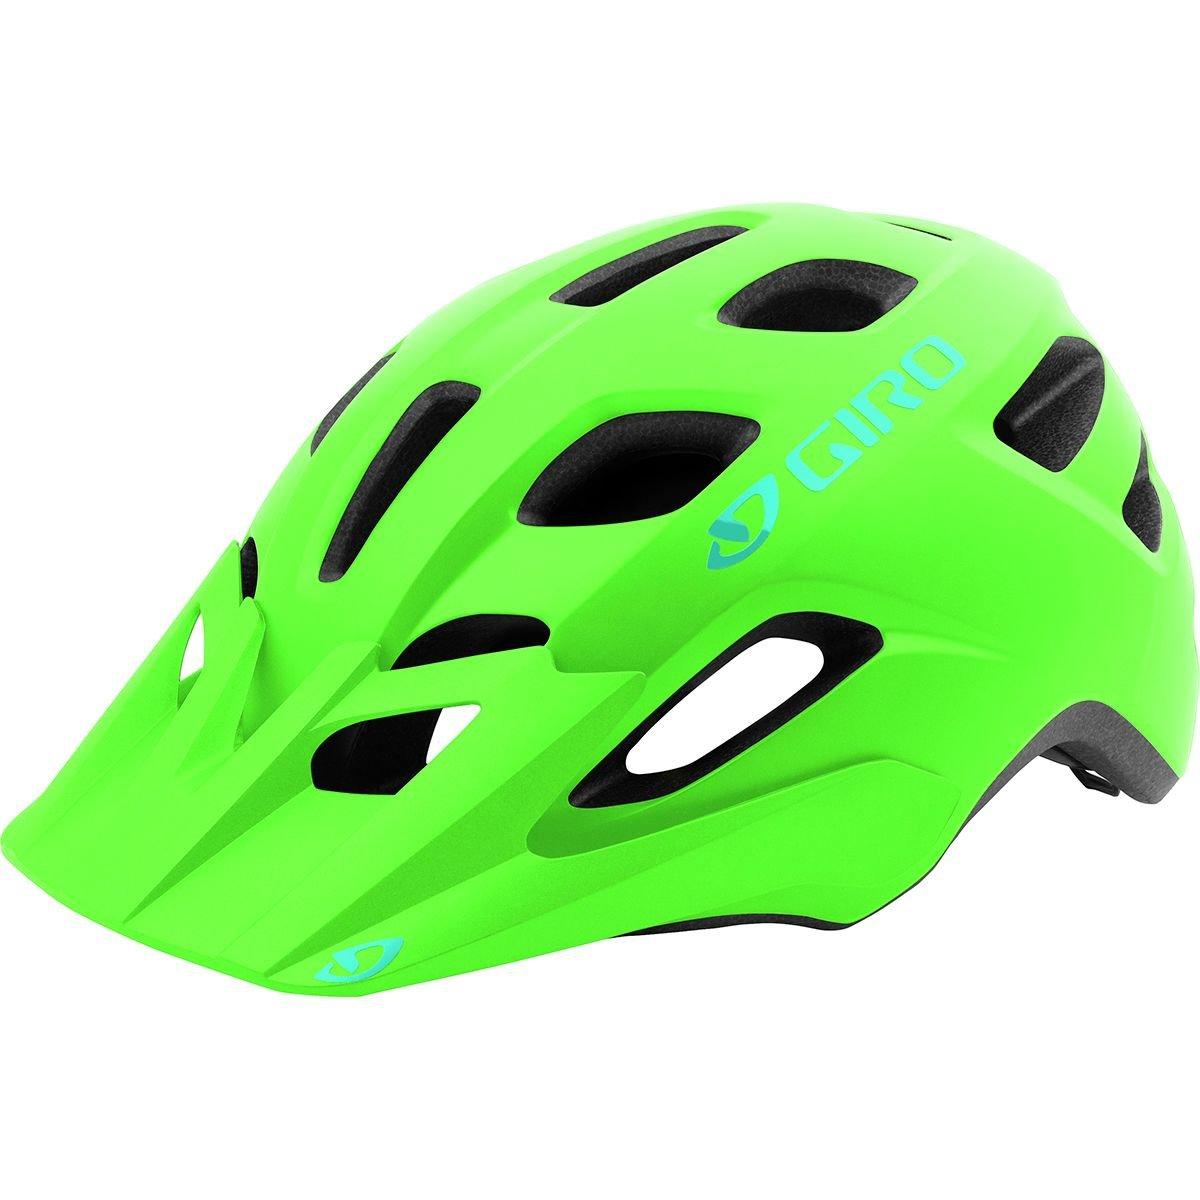 Giro Fixture MIPS Bike Helmet - Matte Lime by Giro